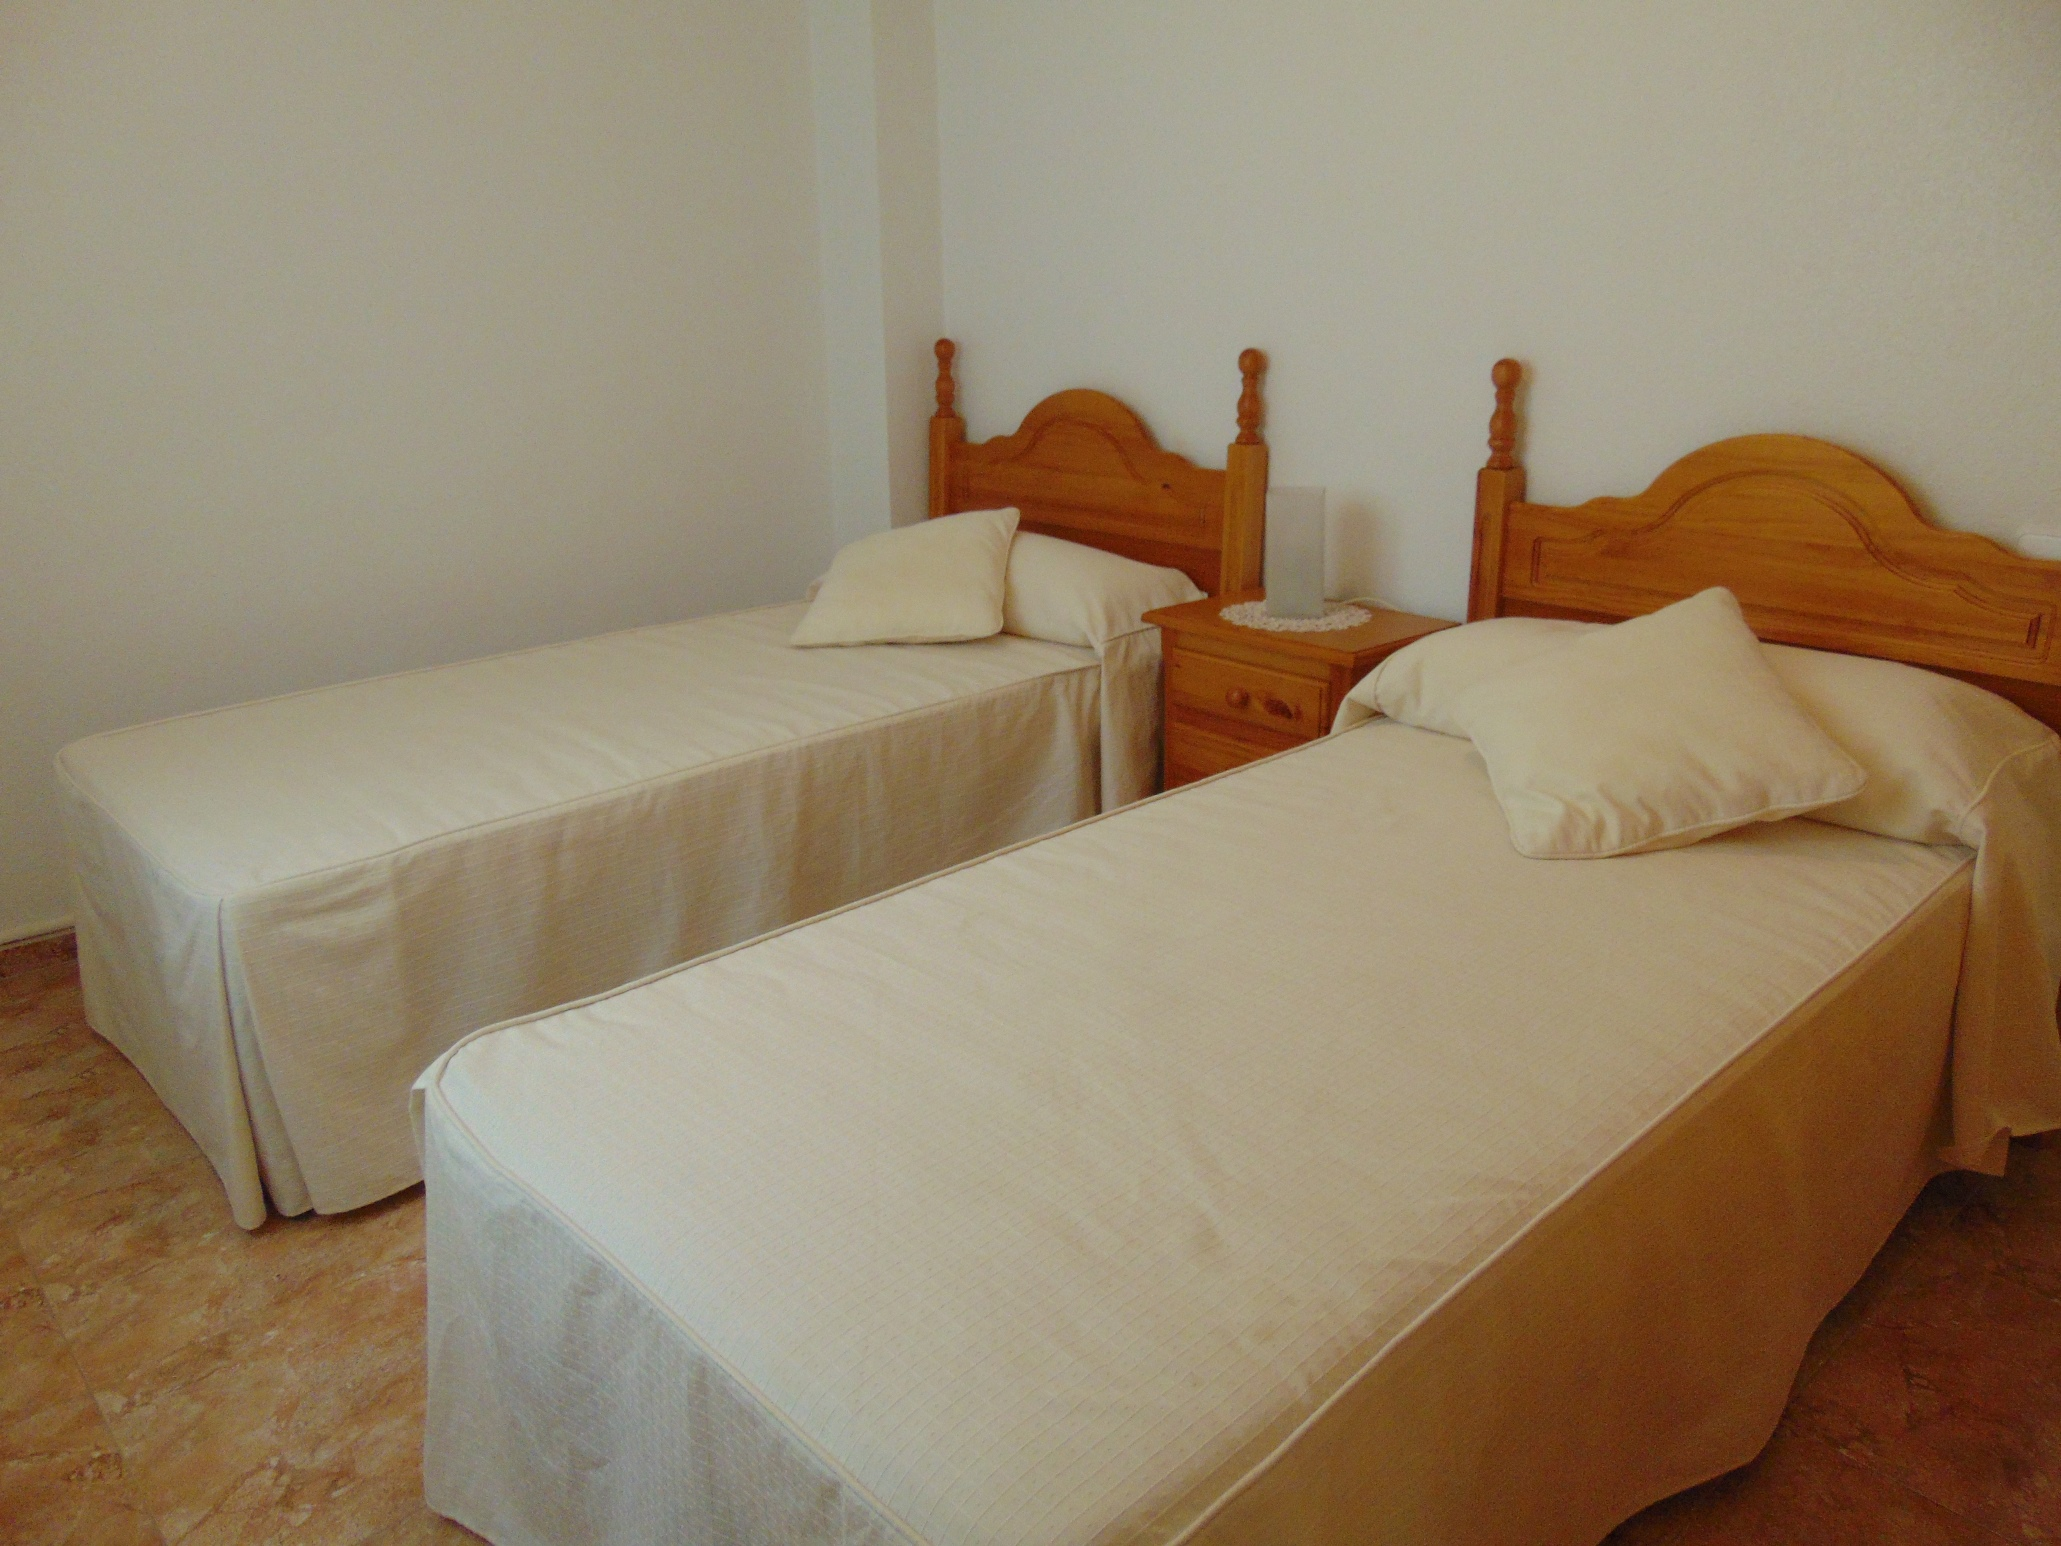 Propery For Sale in San Pedro del Pinatar, Spain image 16